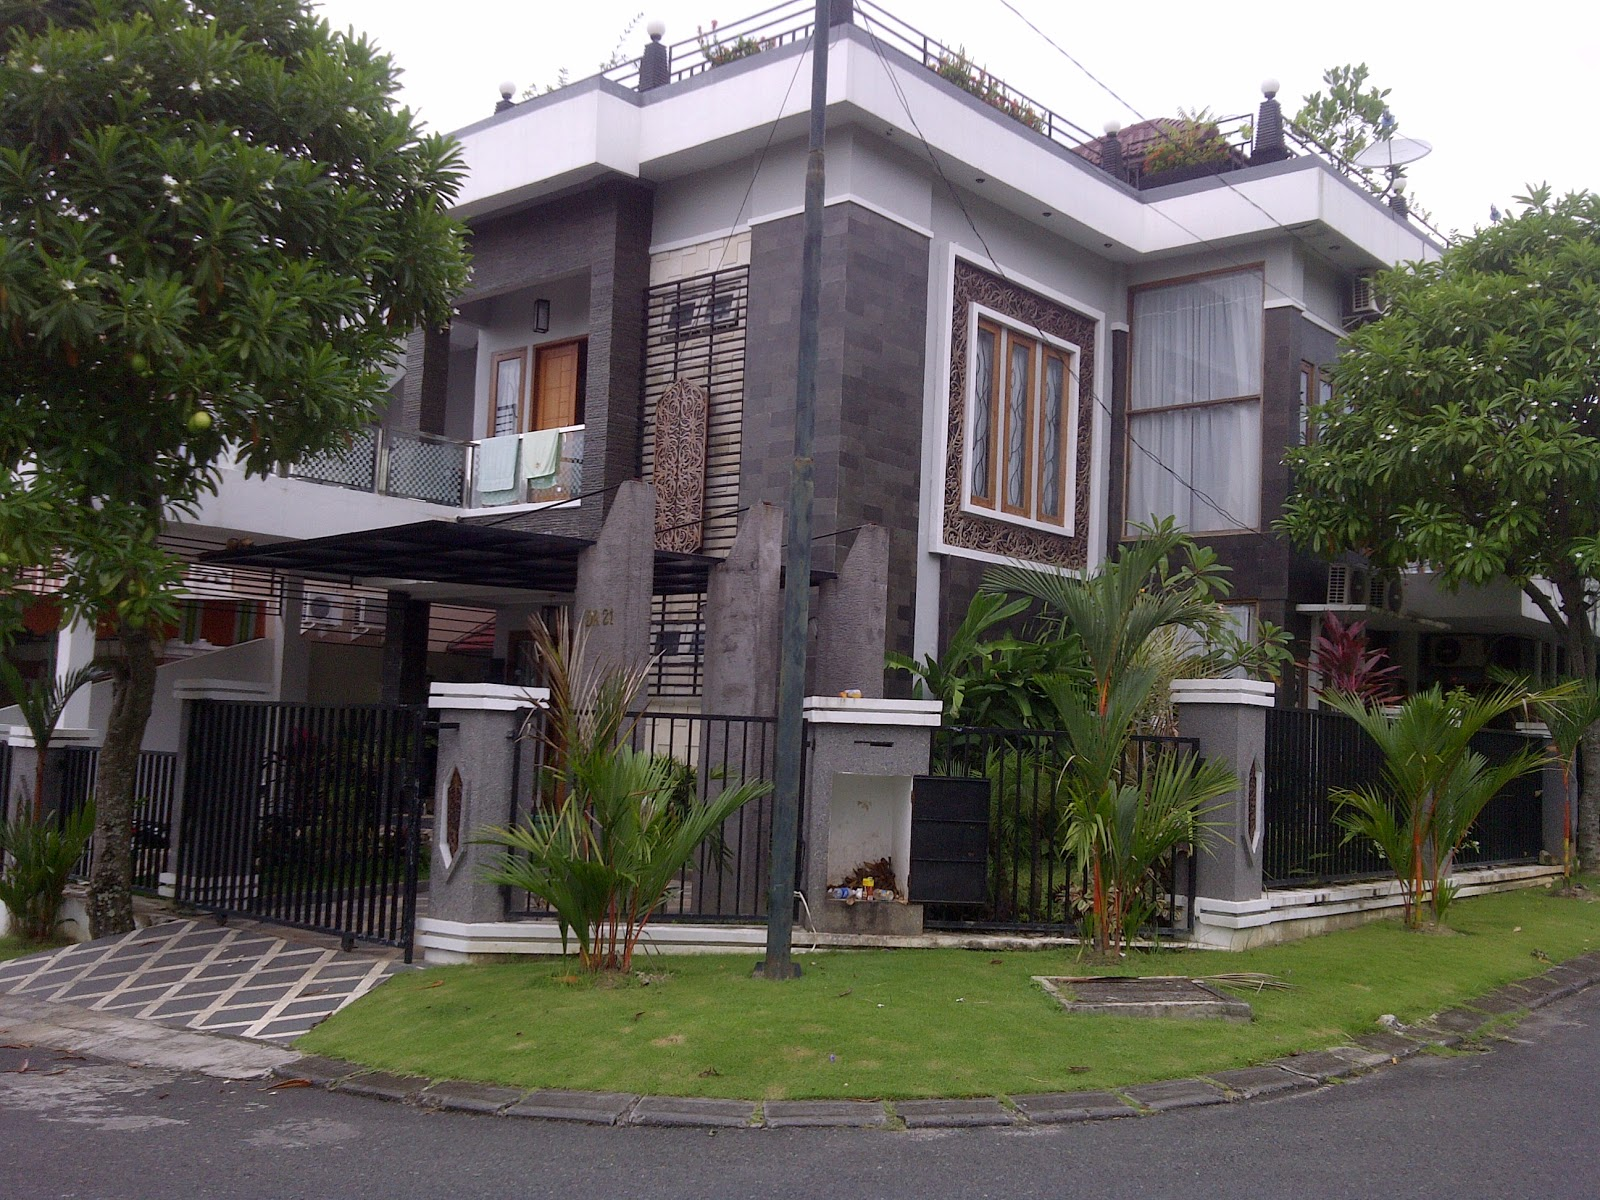 Jual Beli Sewa Property Rumah Dijual